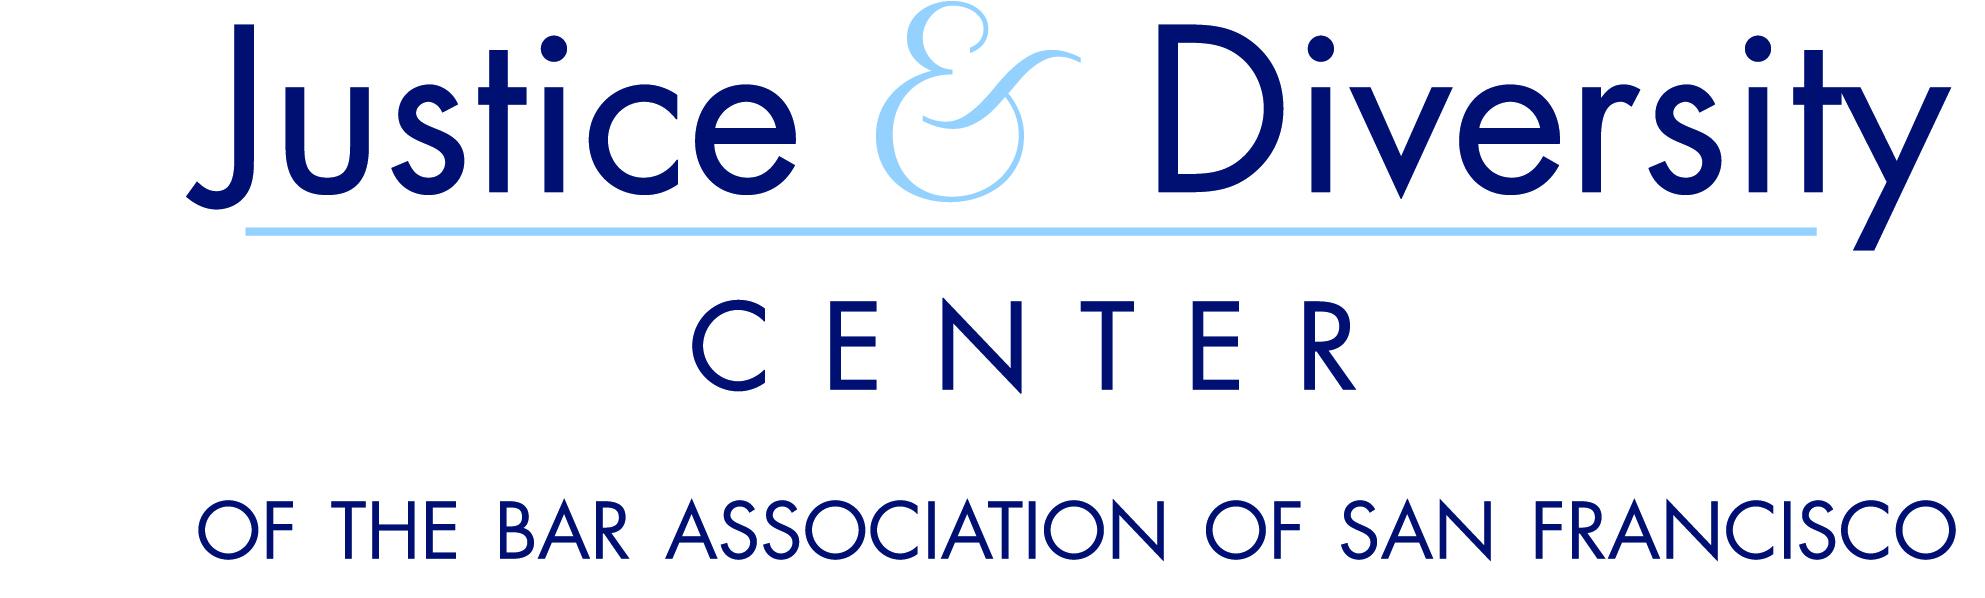 Justice & Diversity Center - Bar Association of San Francisco